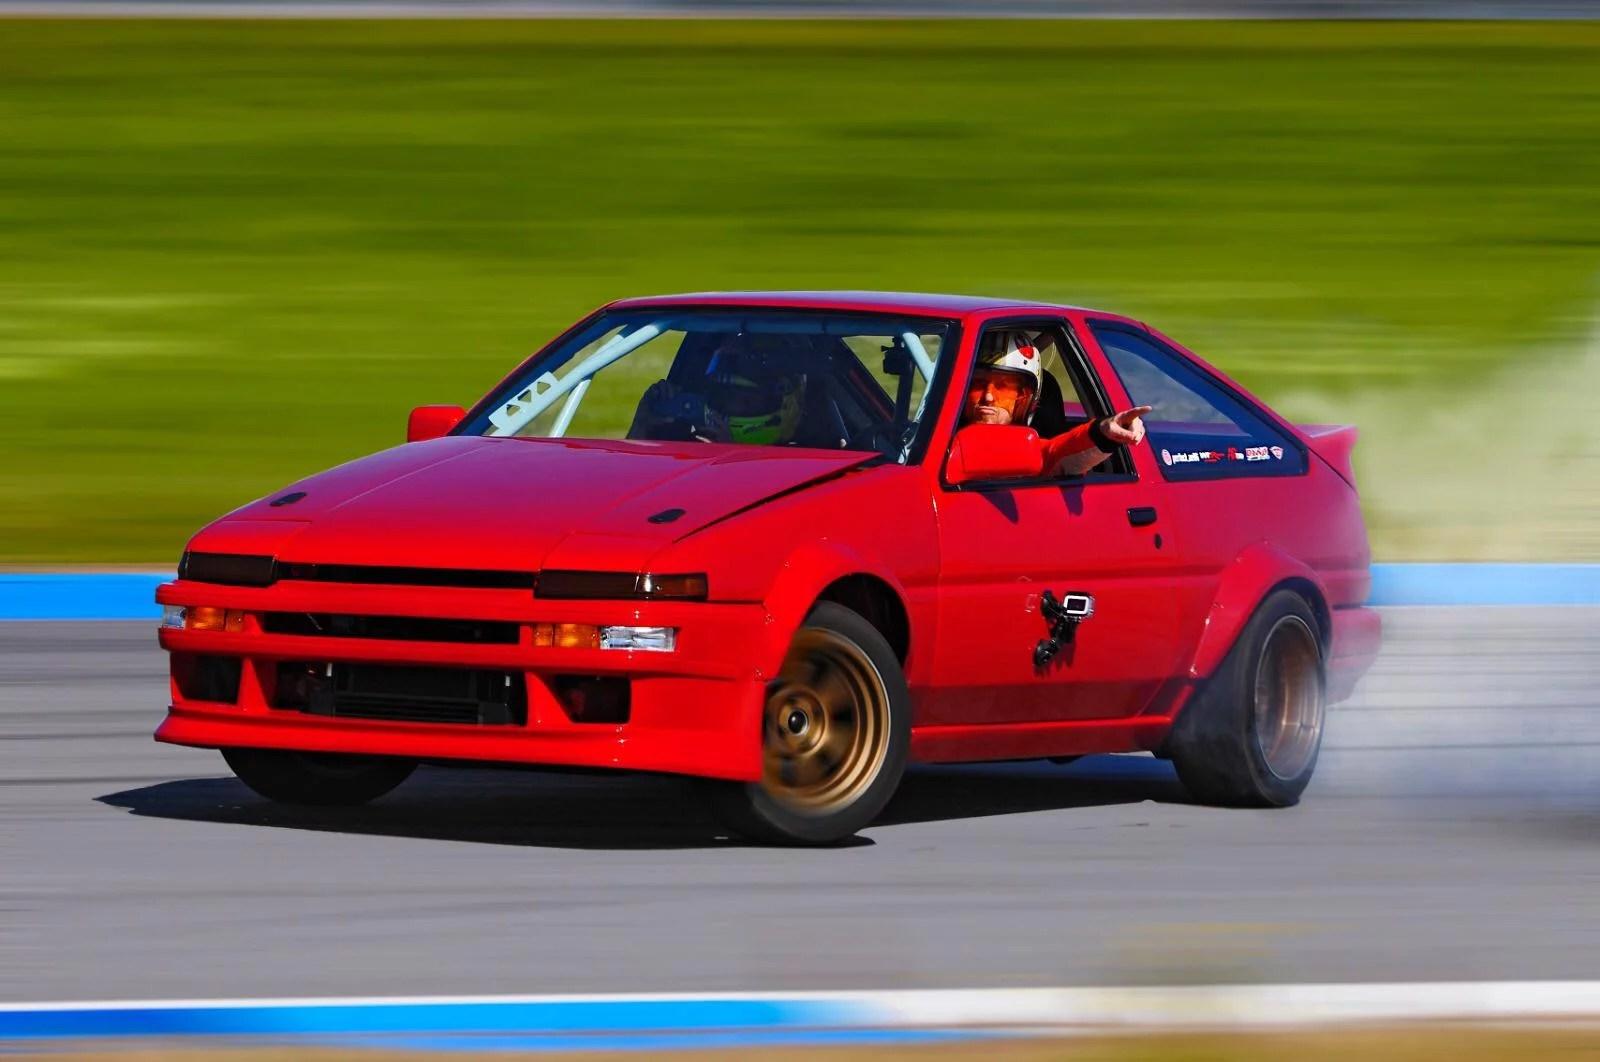 AE86- Toyota Sprinter Trueno- Montero